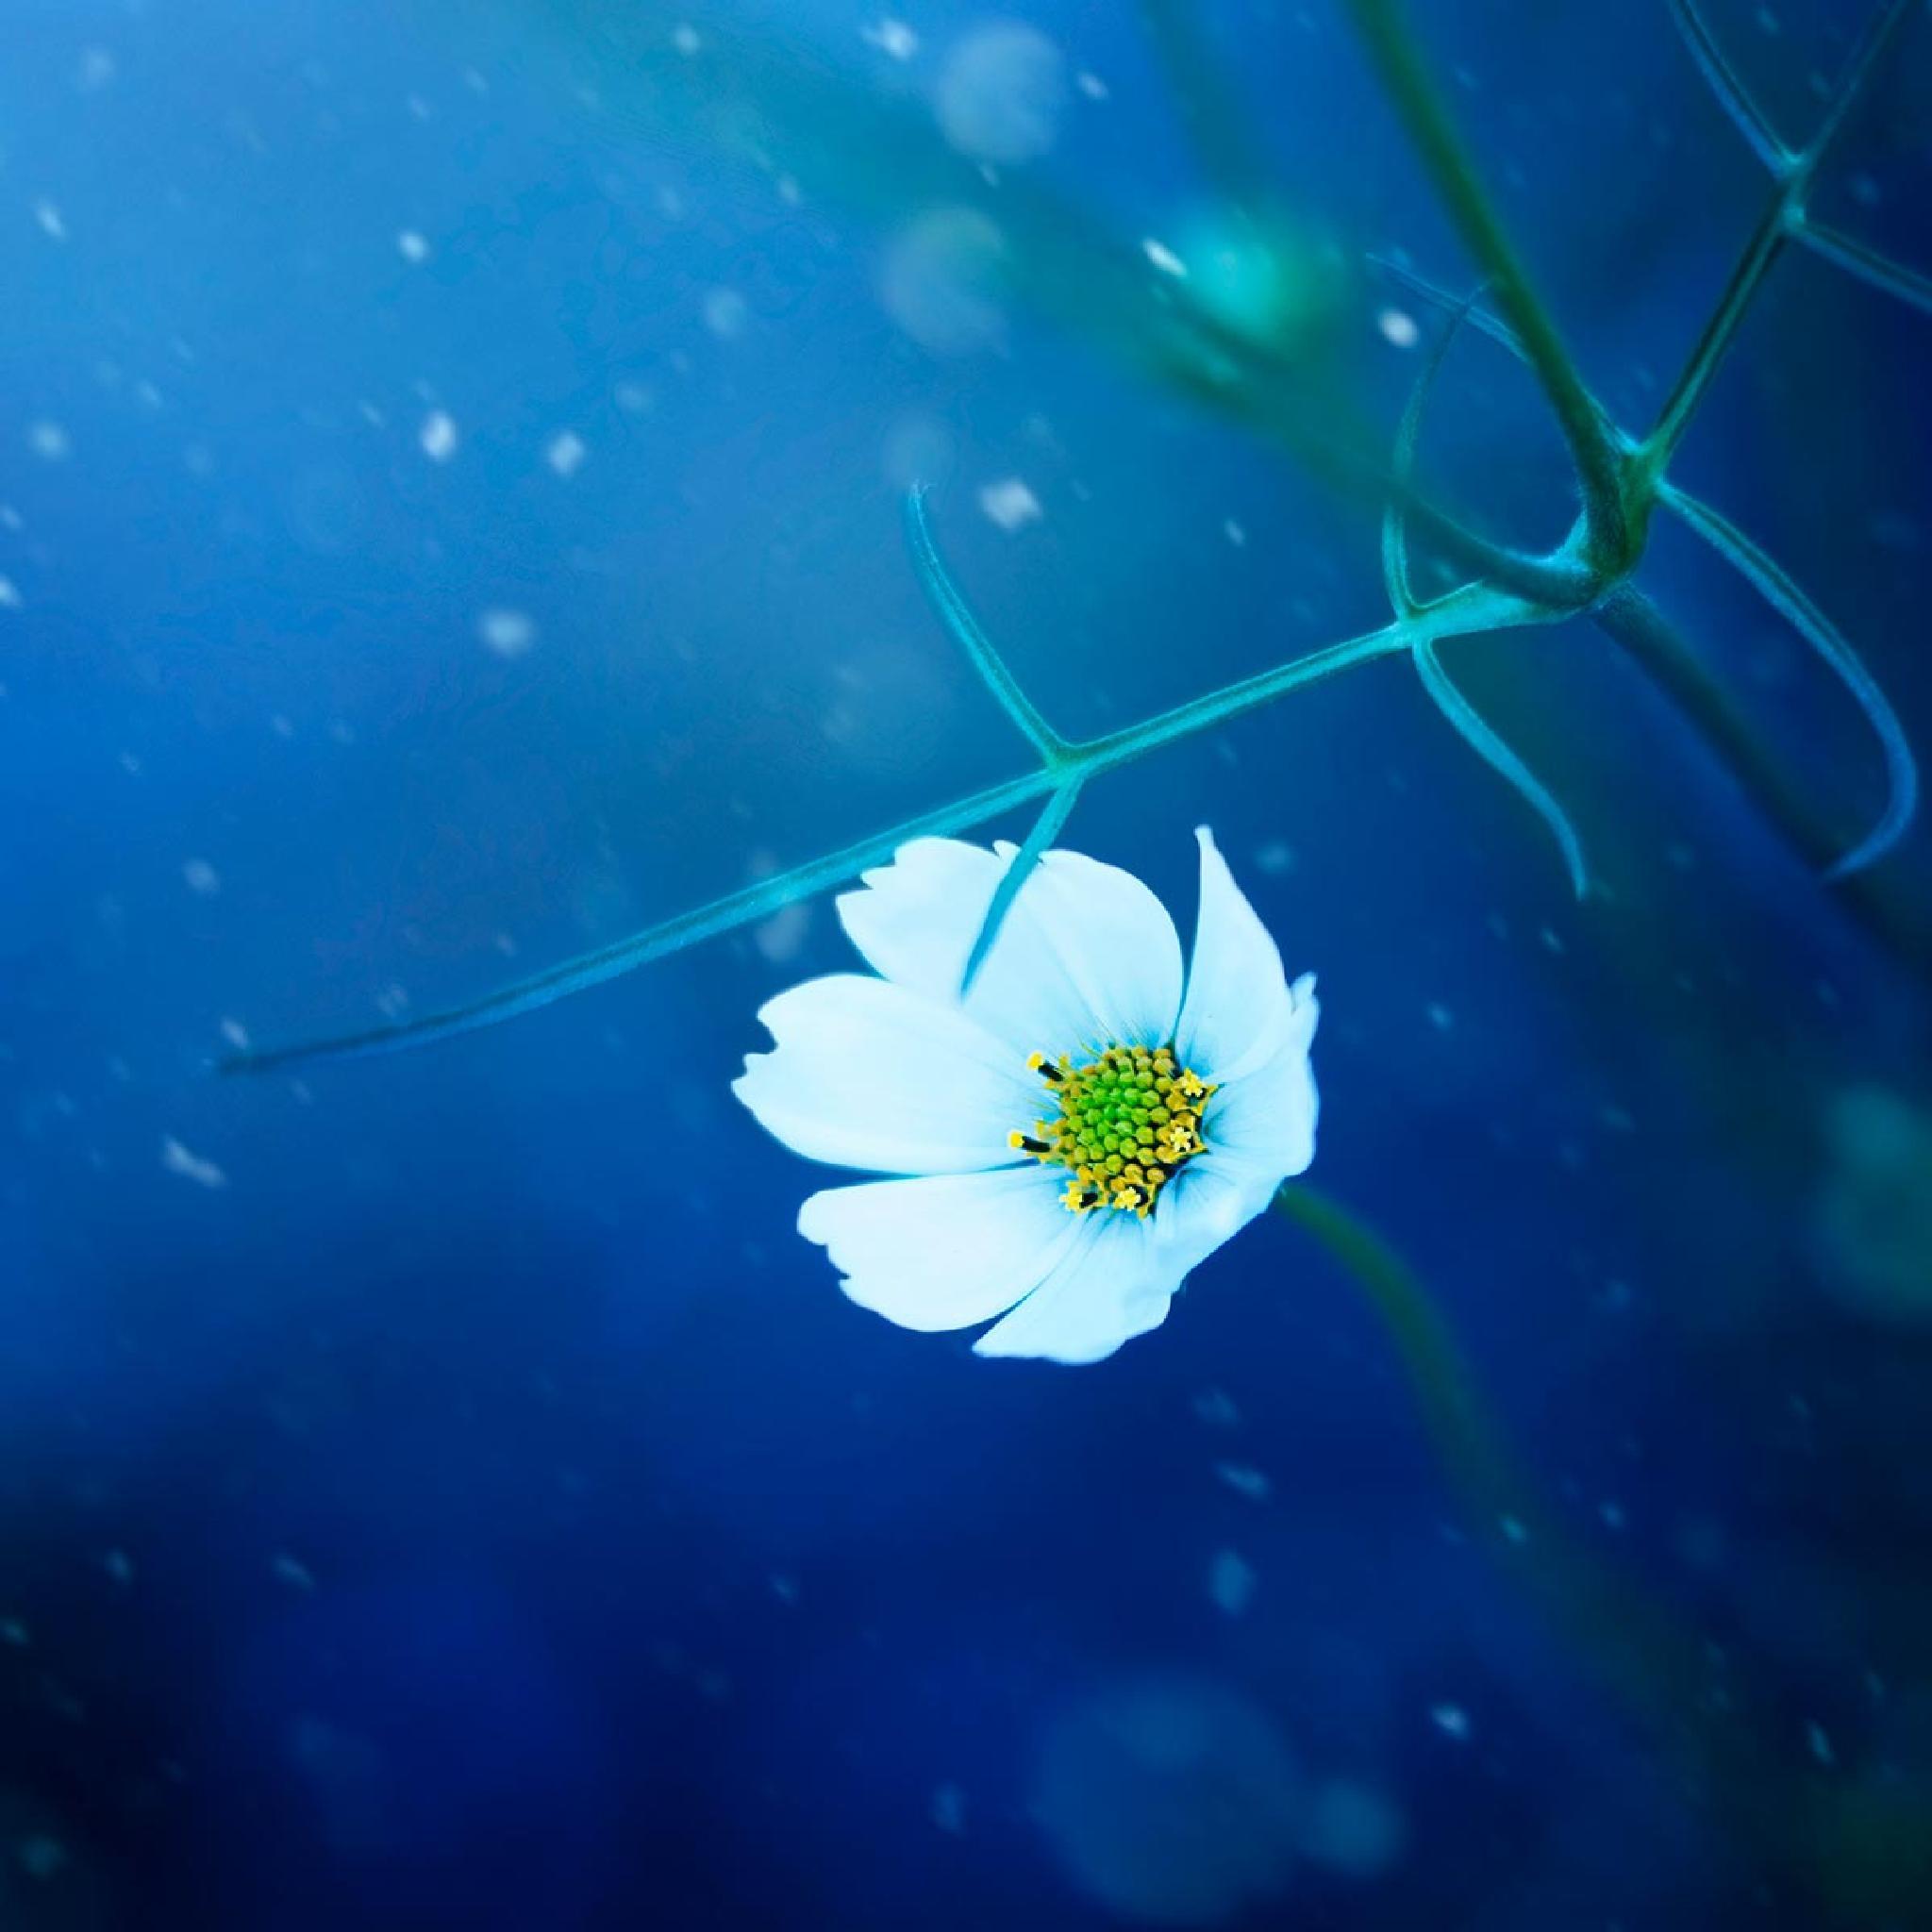 Snow queen by Ashraful Arefin